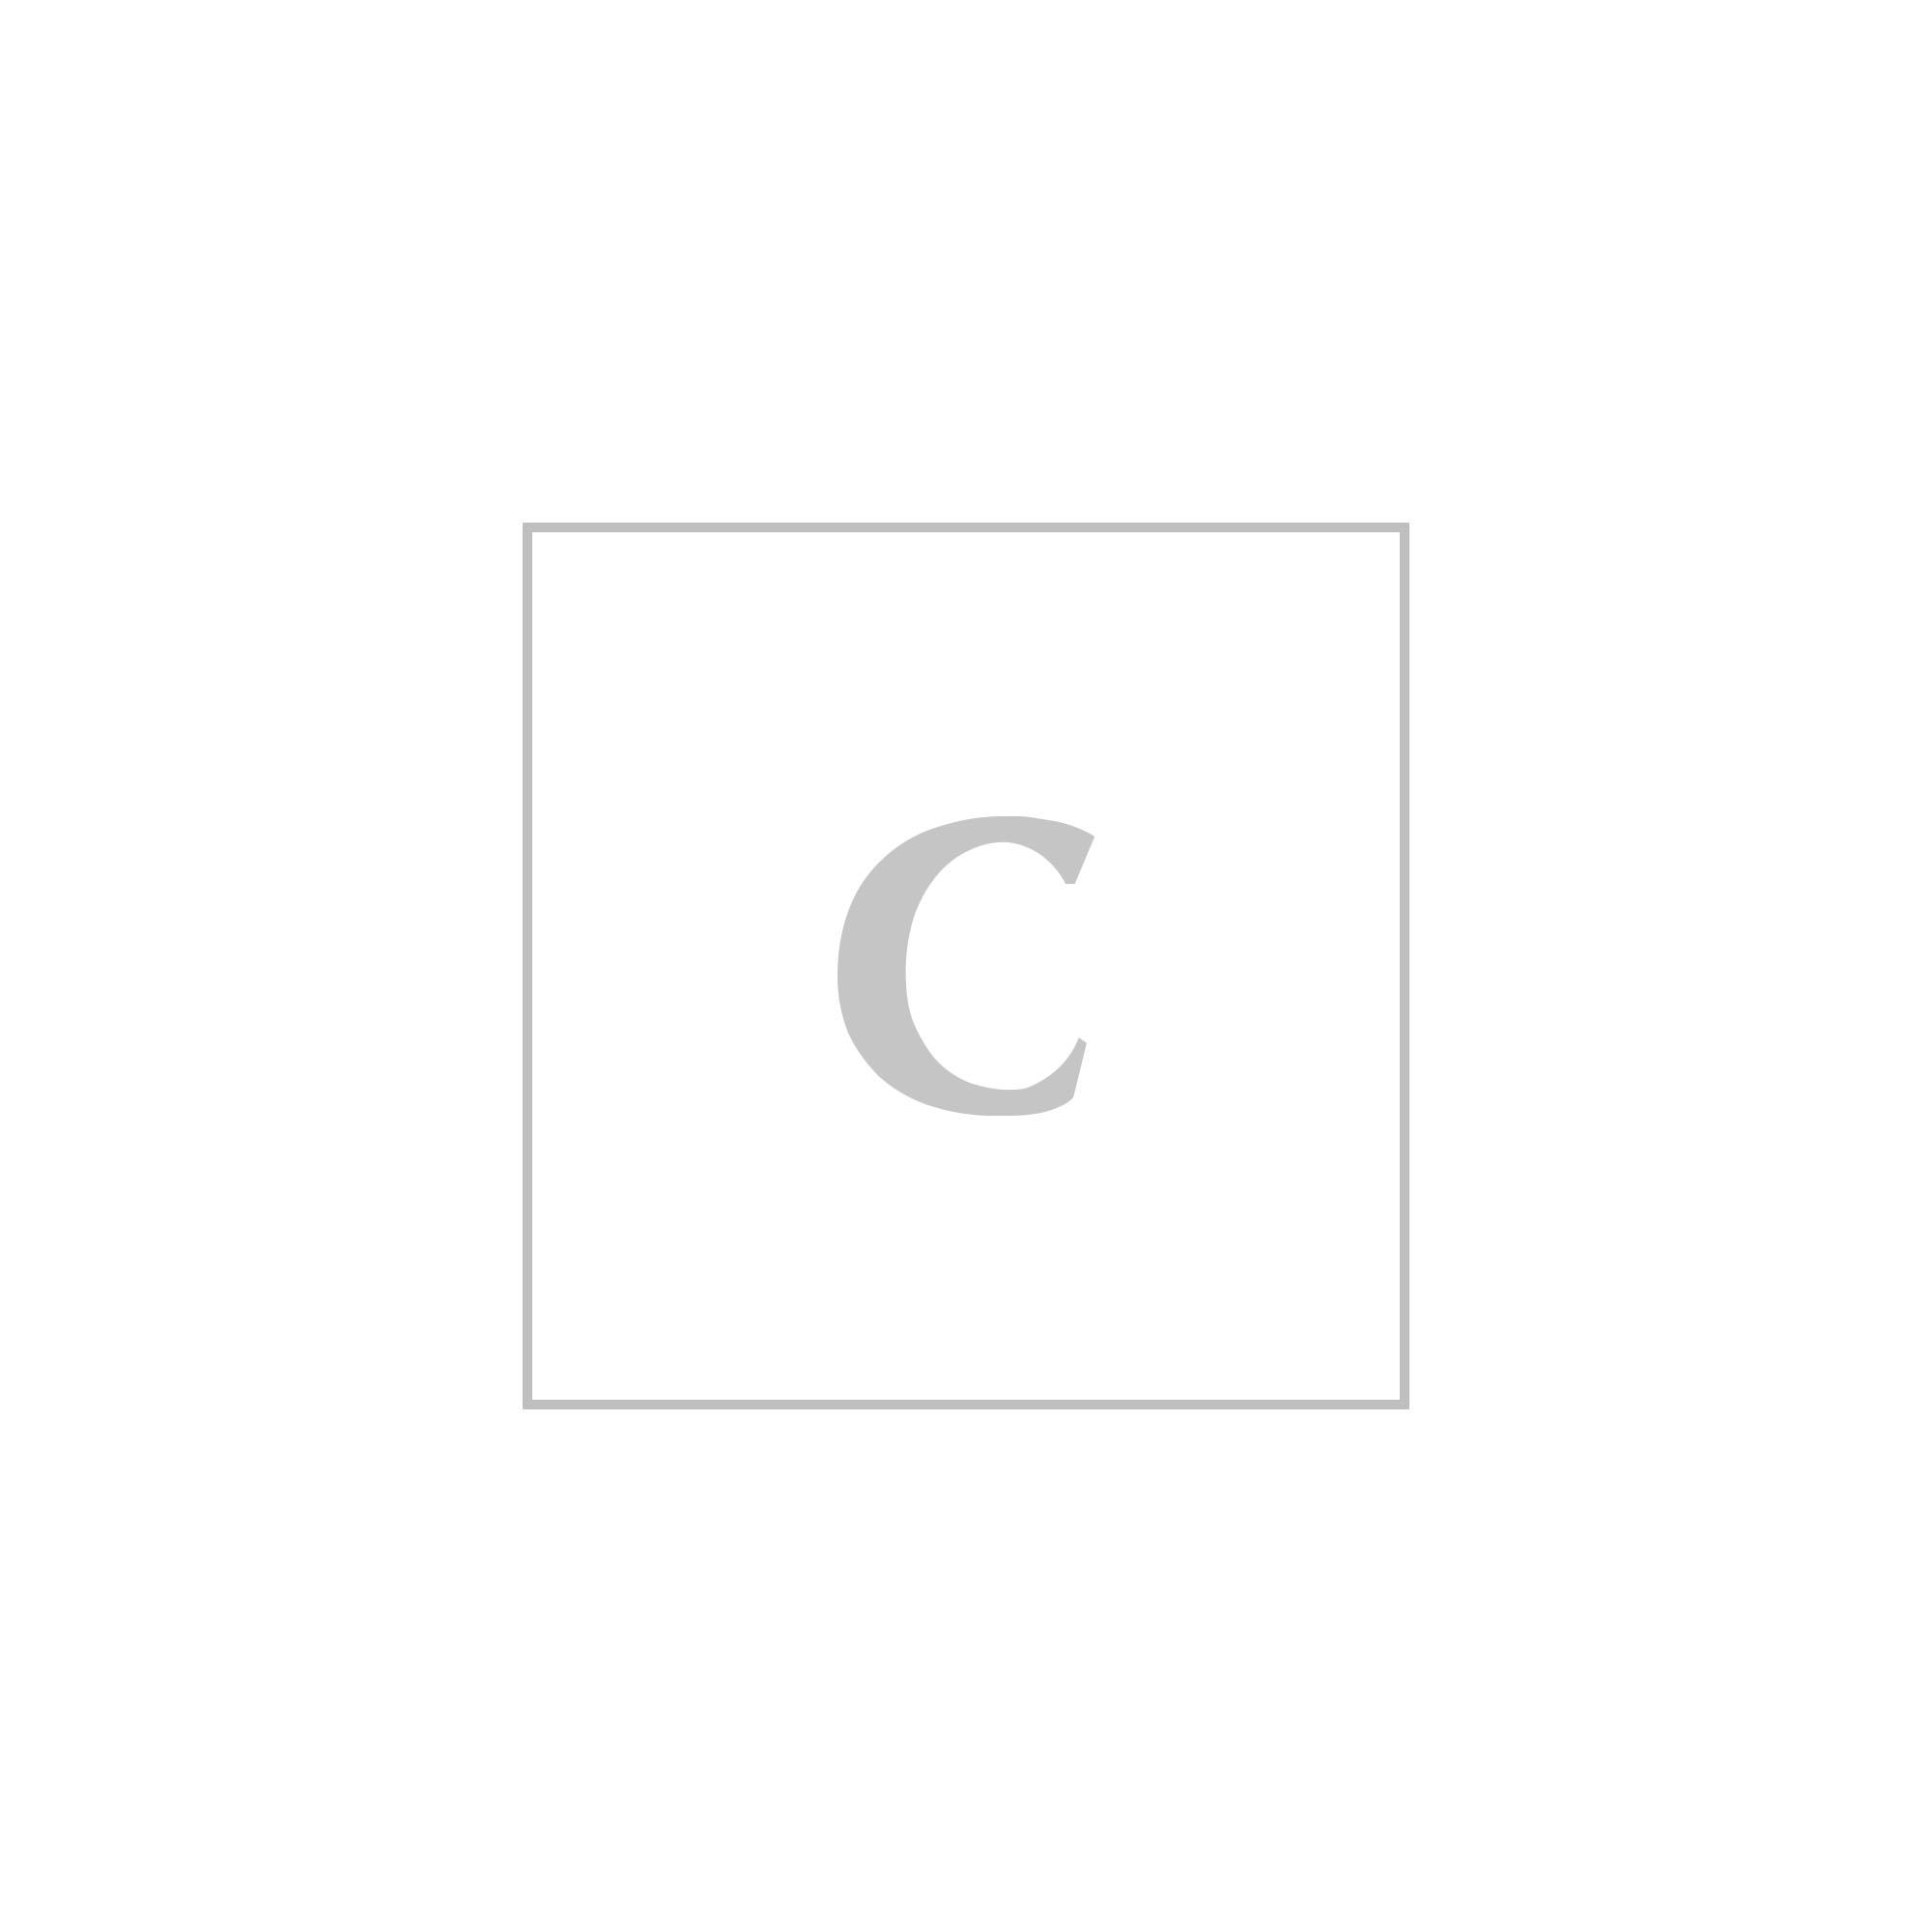 Chiara ferragni iphone 6s plus cover